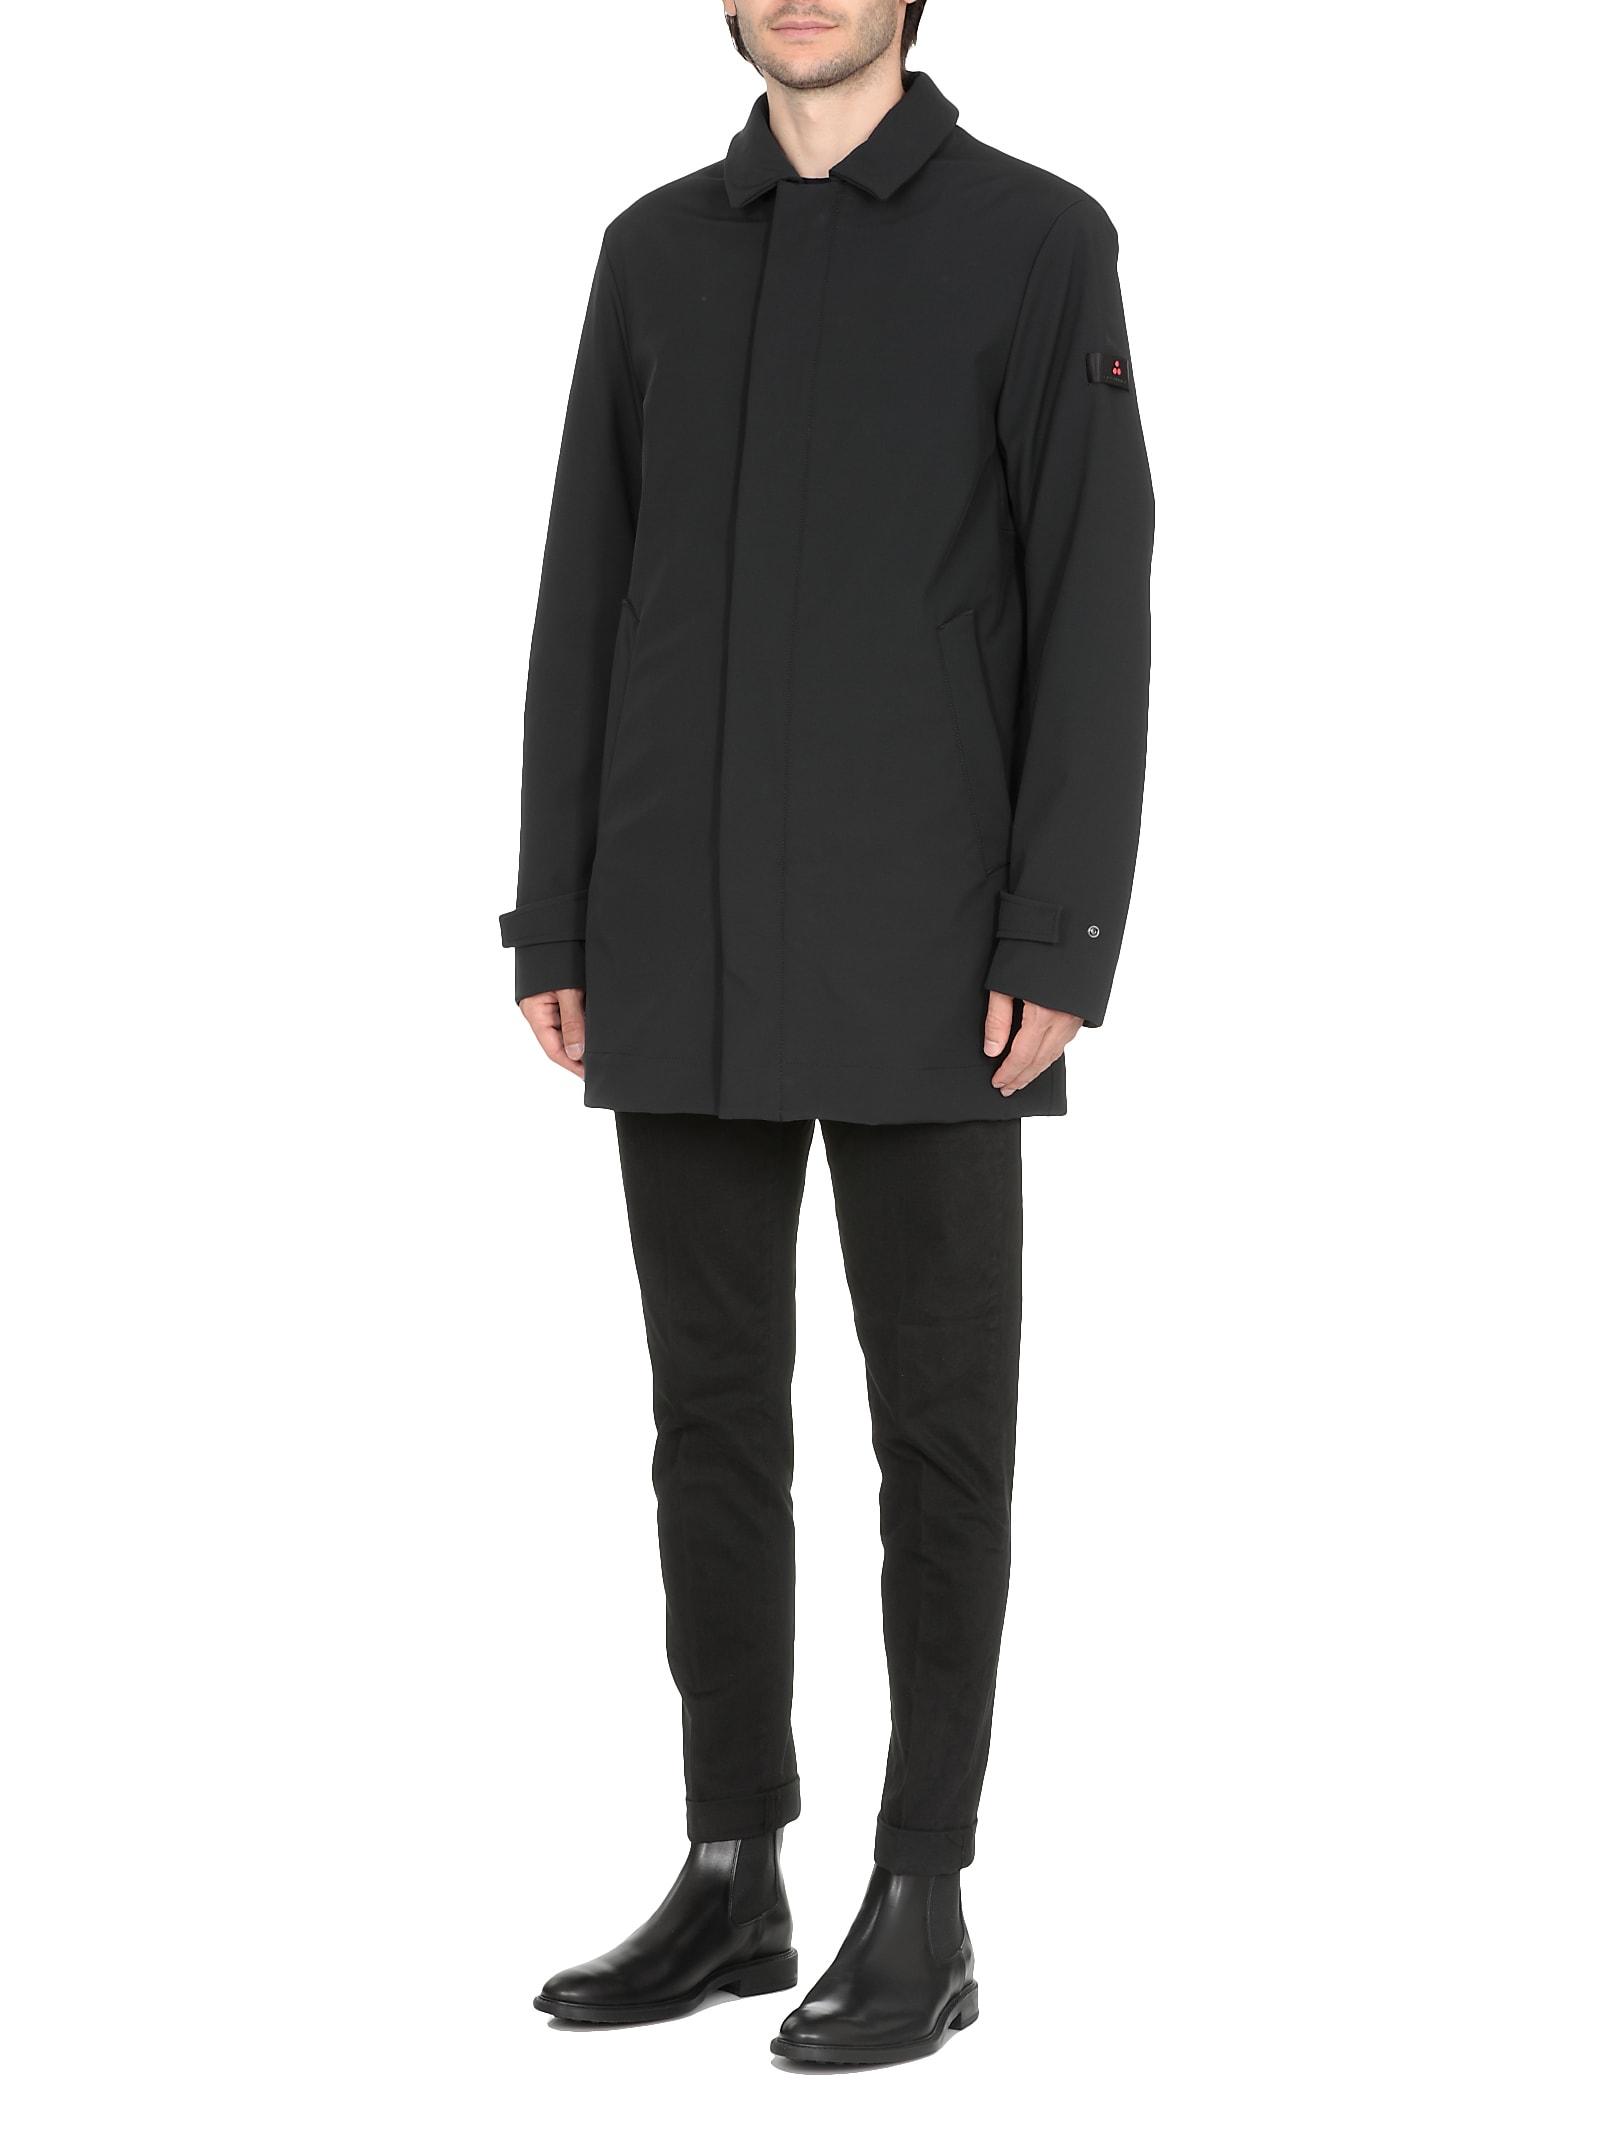 online retailer 43e6a 14186 Peuterey Groff Kp Coat